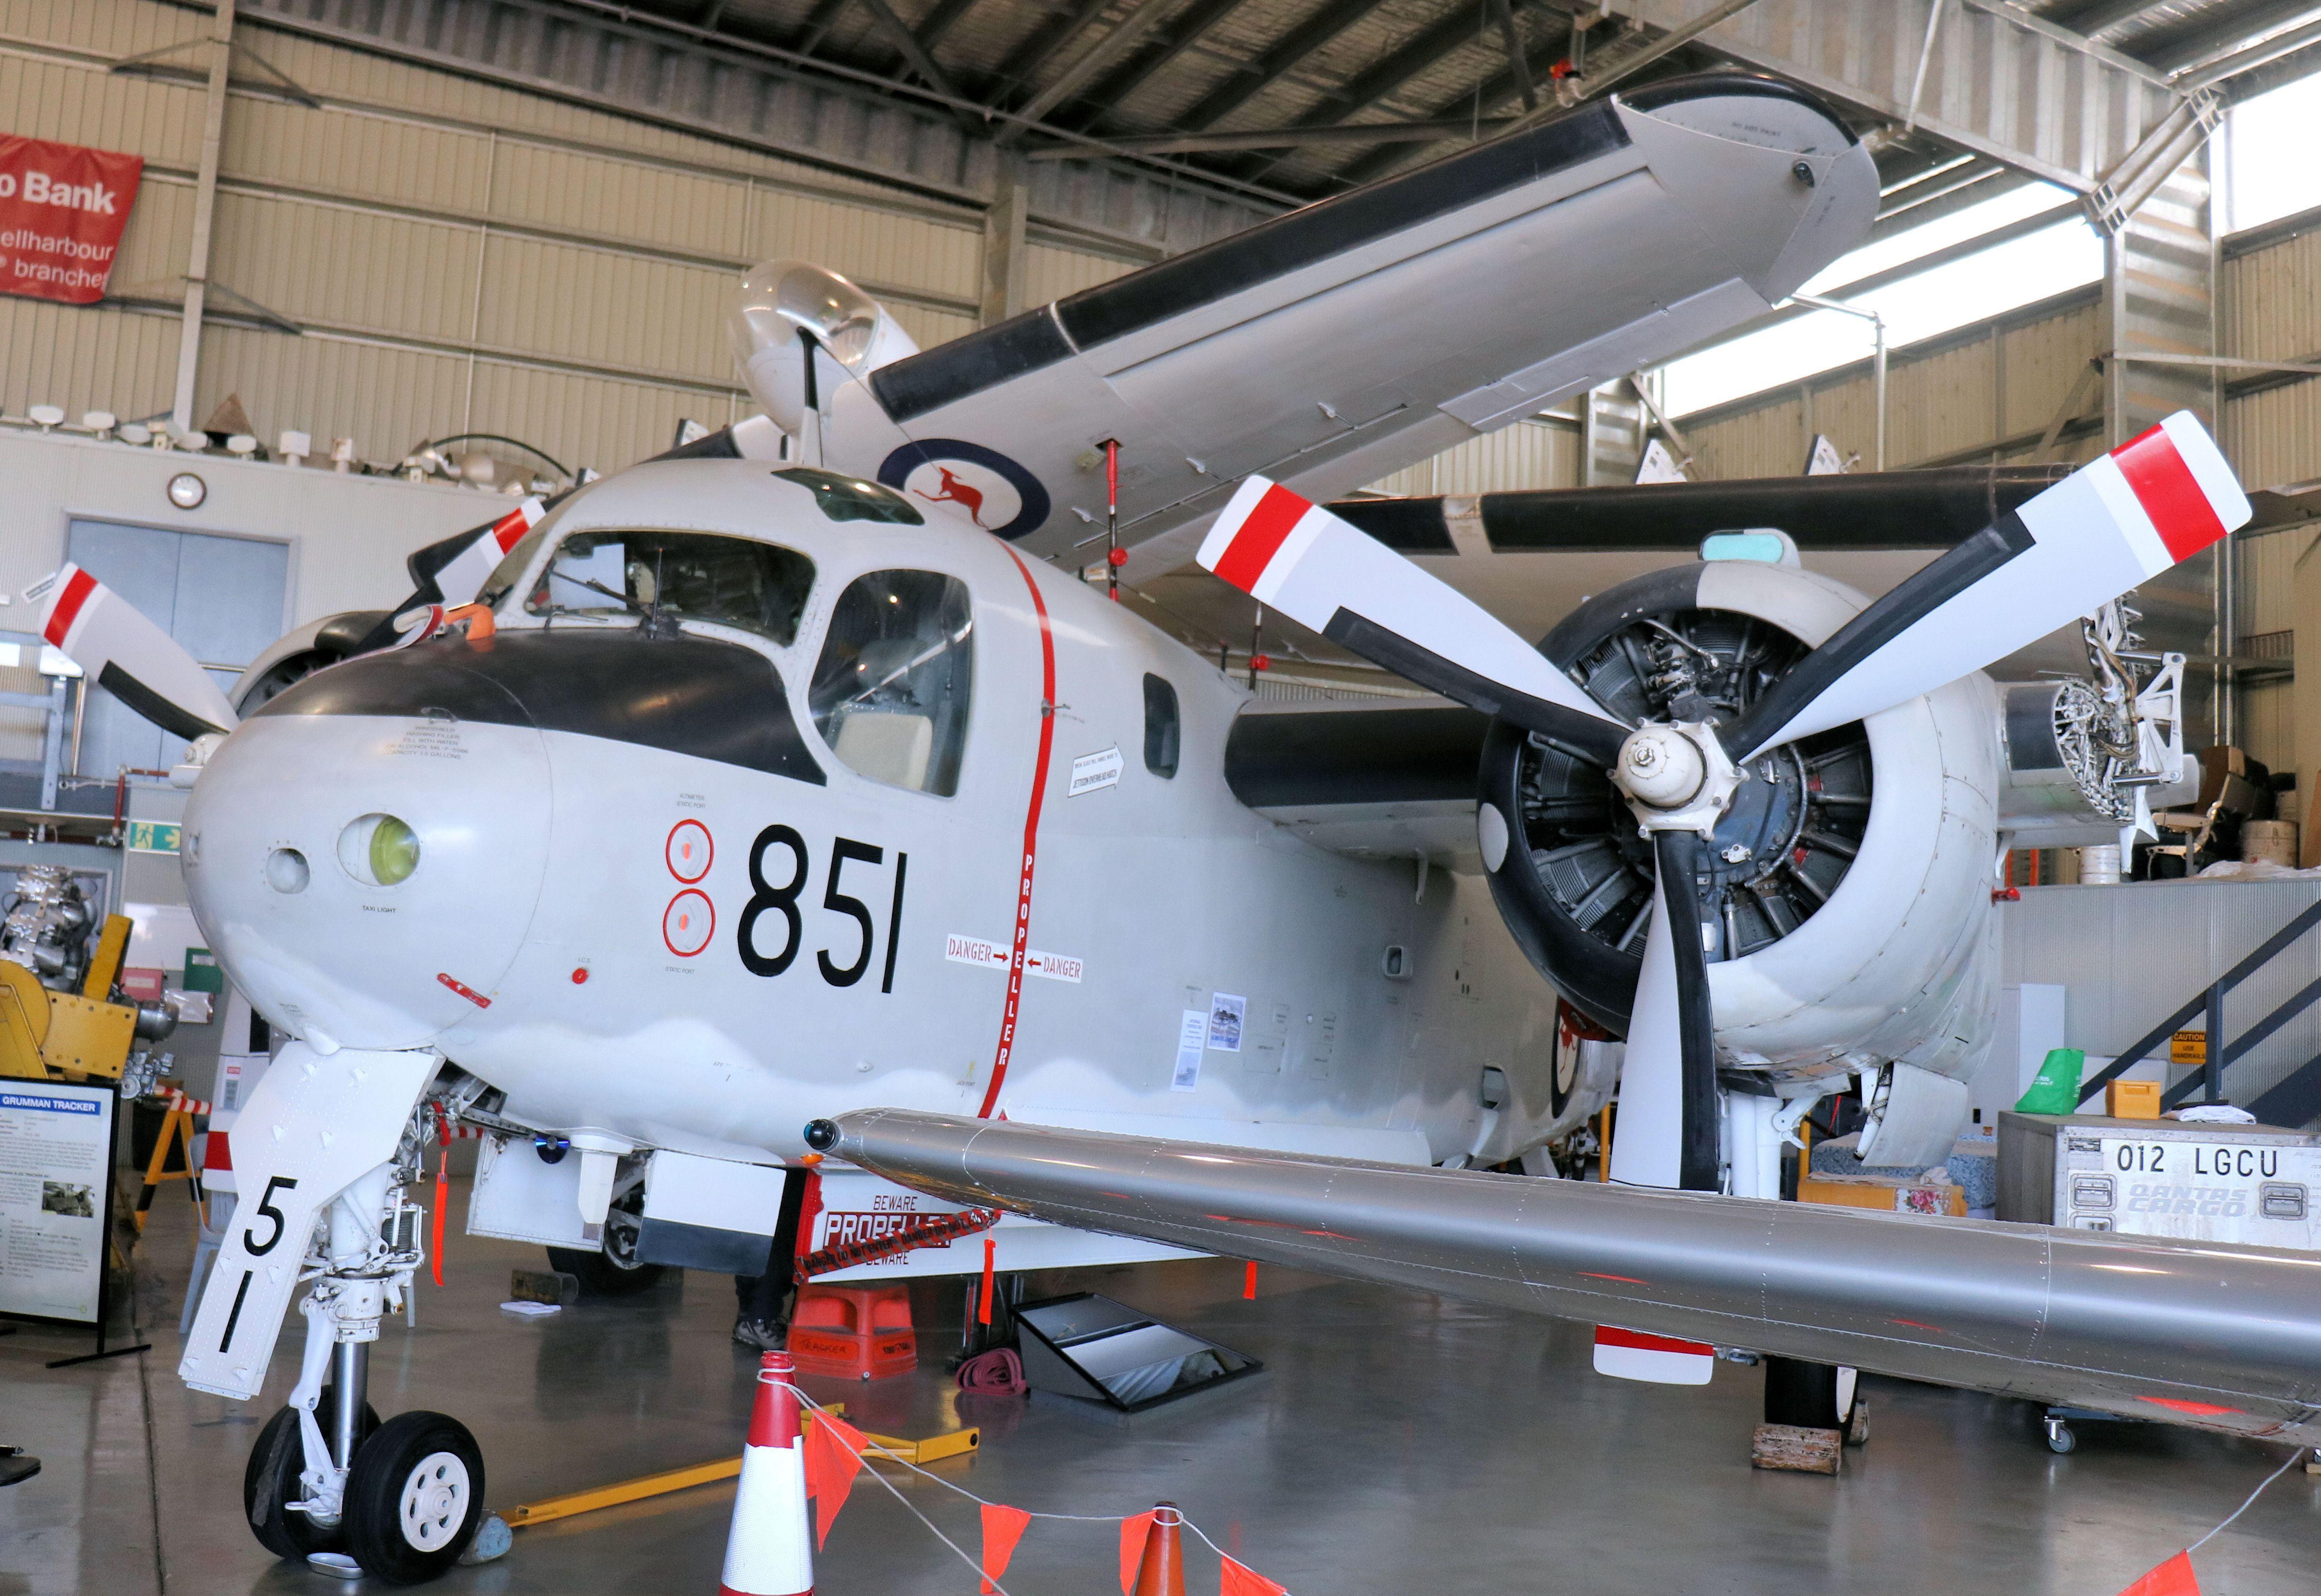 Grumman S2 Tracker Destination S Journey Us Navy Aircraft Aviation Aircraft